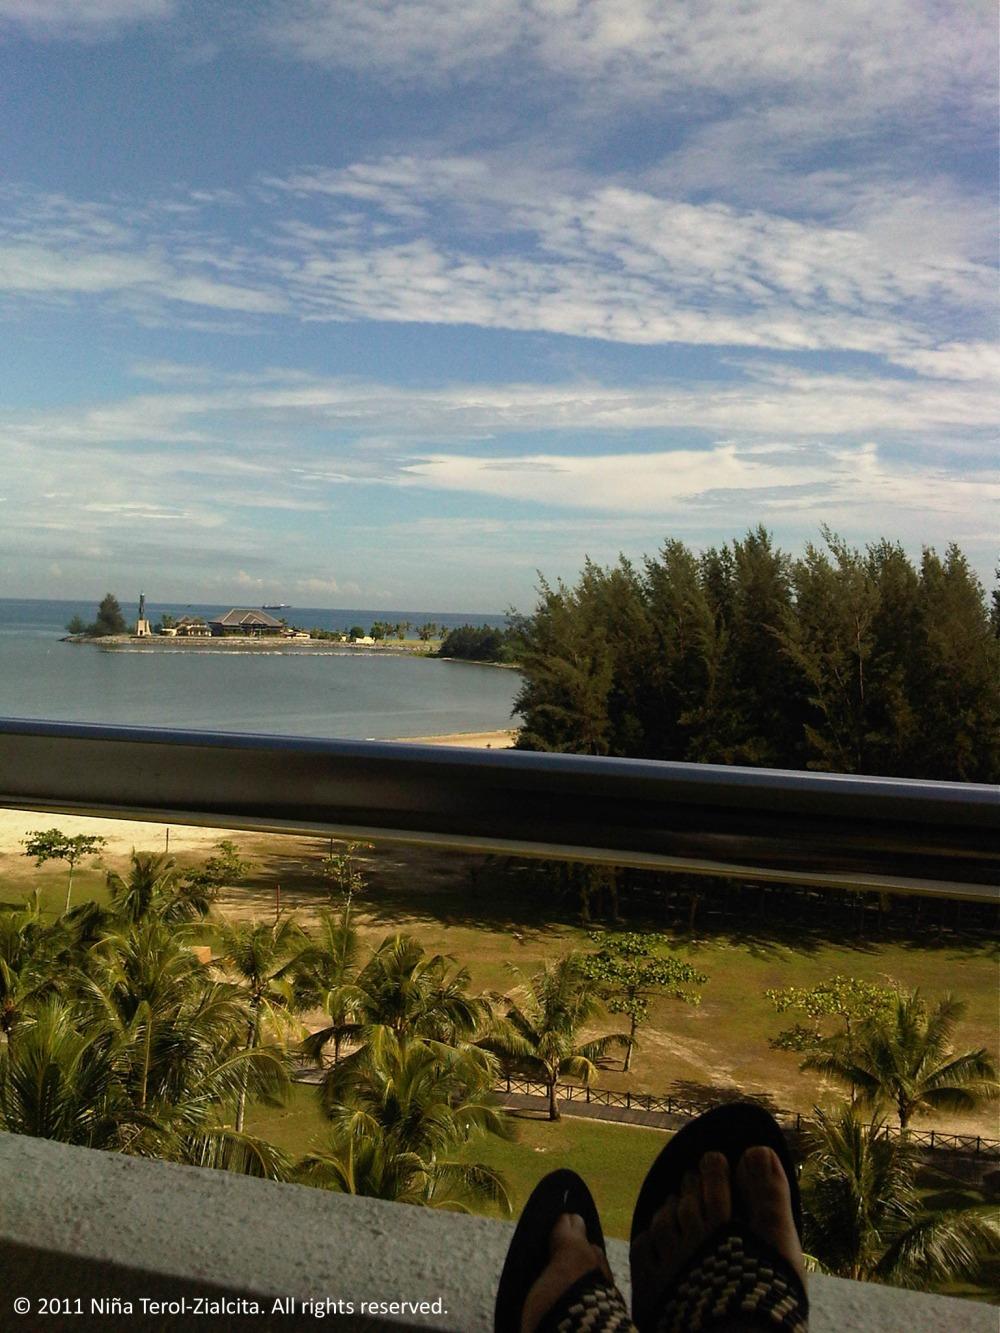 My veranda in Miri (Parkcity Everly Hotel, Miri, Sarawak, Malaysia)